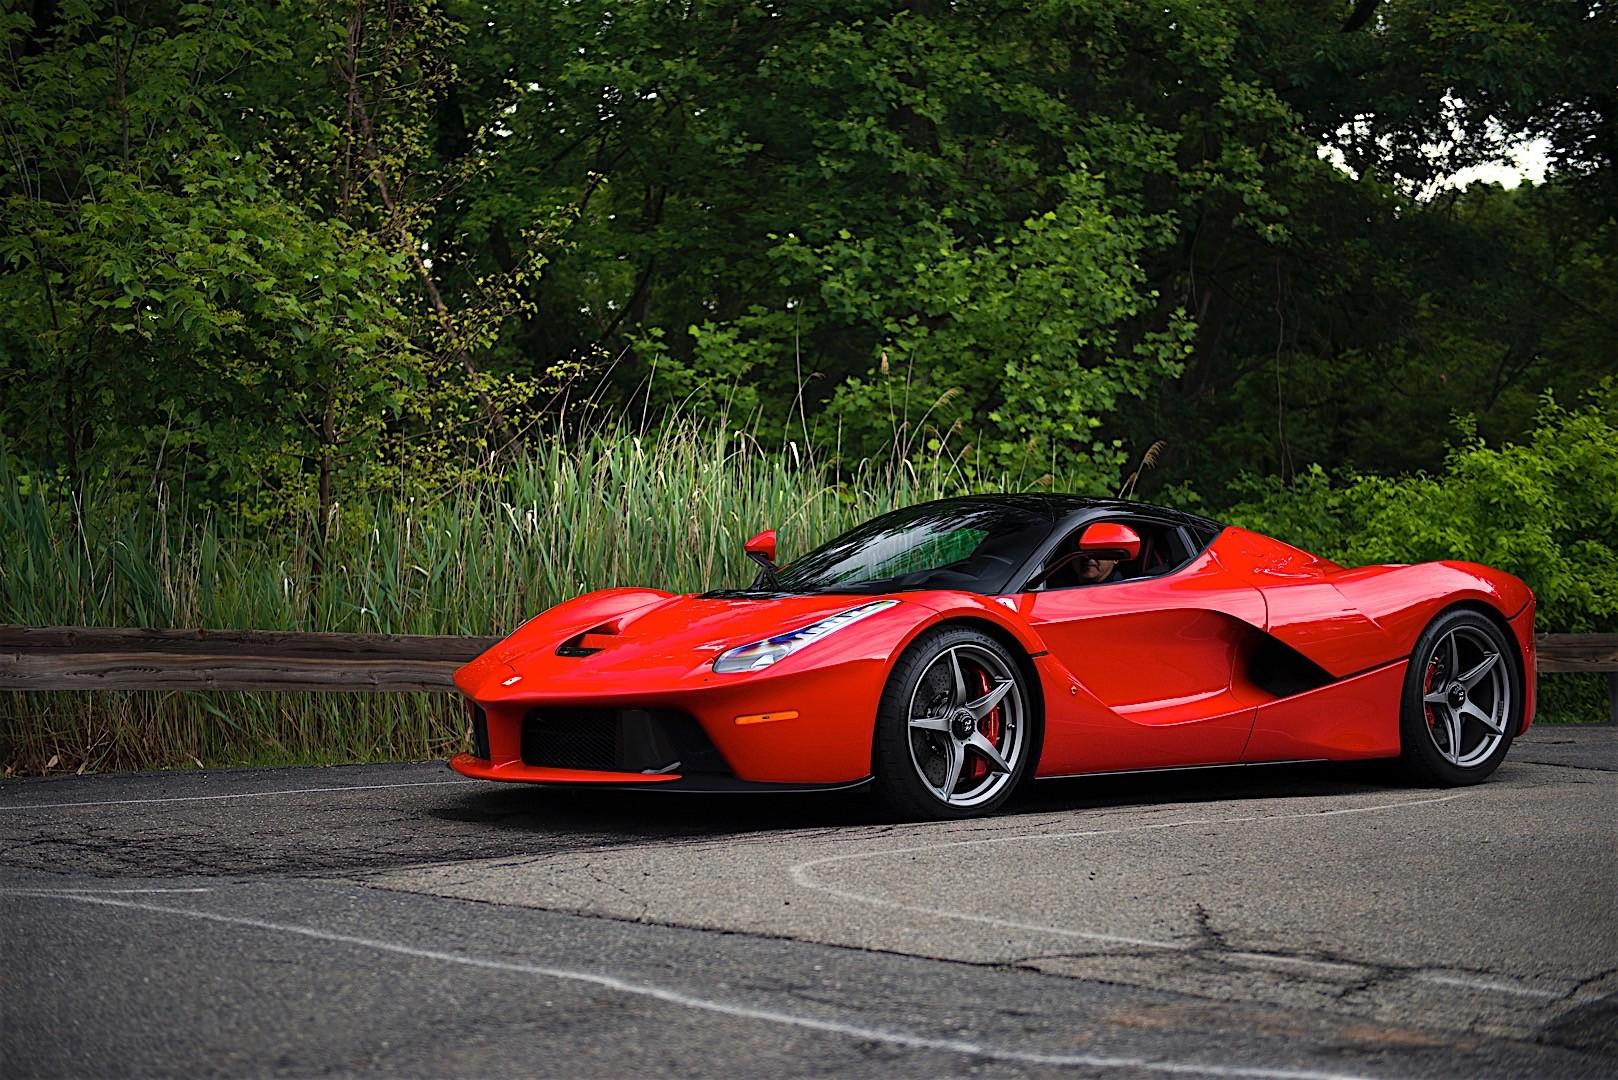 Ferrari Laferrari 2013 likewise Parts additionally 06 likewise 96 likewise Mitsubishi Outlander Phev 2016. on electric motor hp calculator